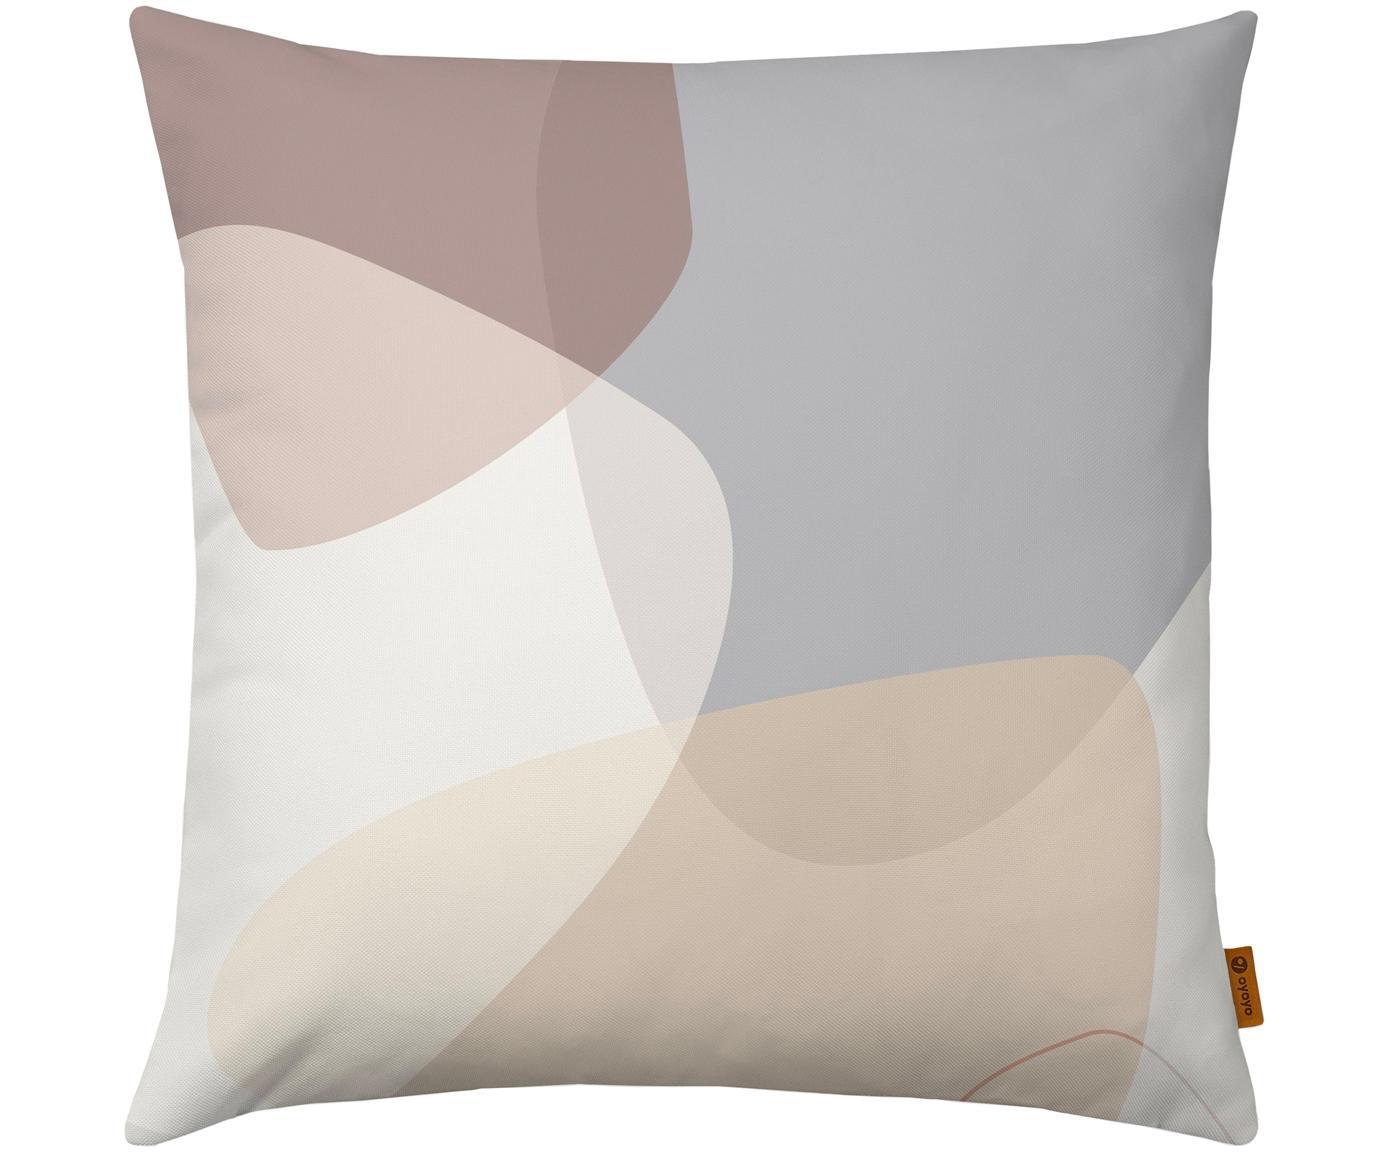 Kissenhülle Graphic mit geometrischem Print, 100% Polyester, Beige, Grau, Creme, Altrosa, 40 x 40 cm